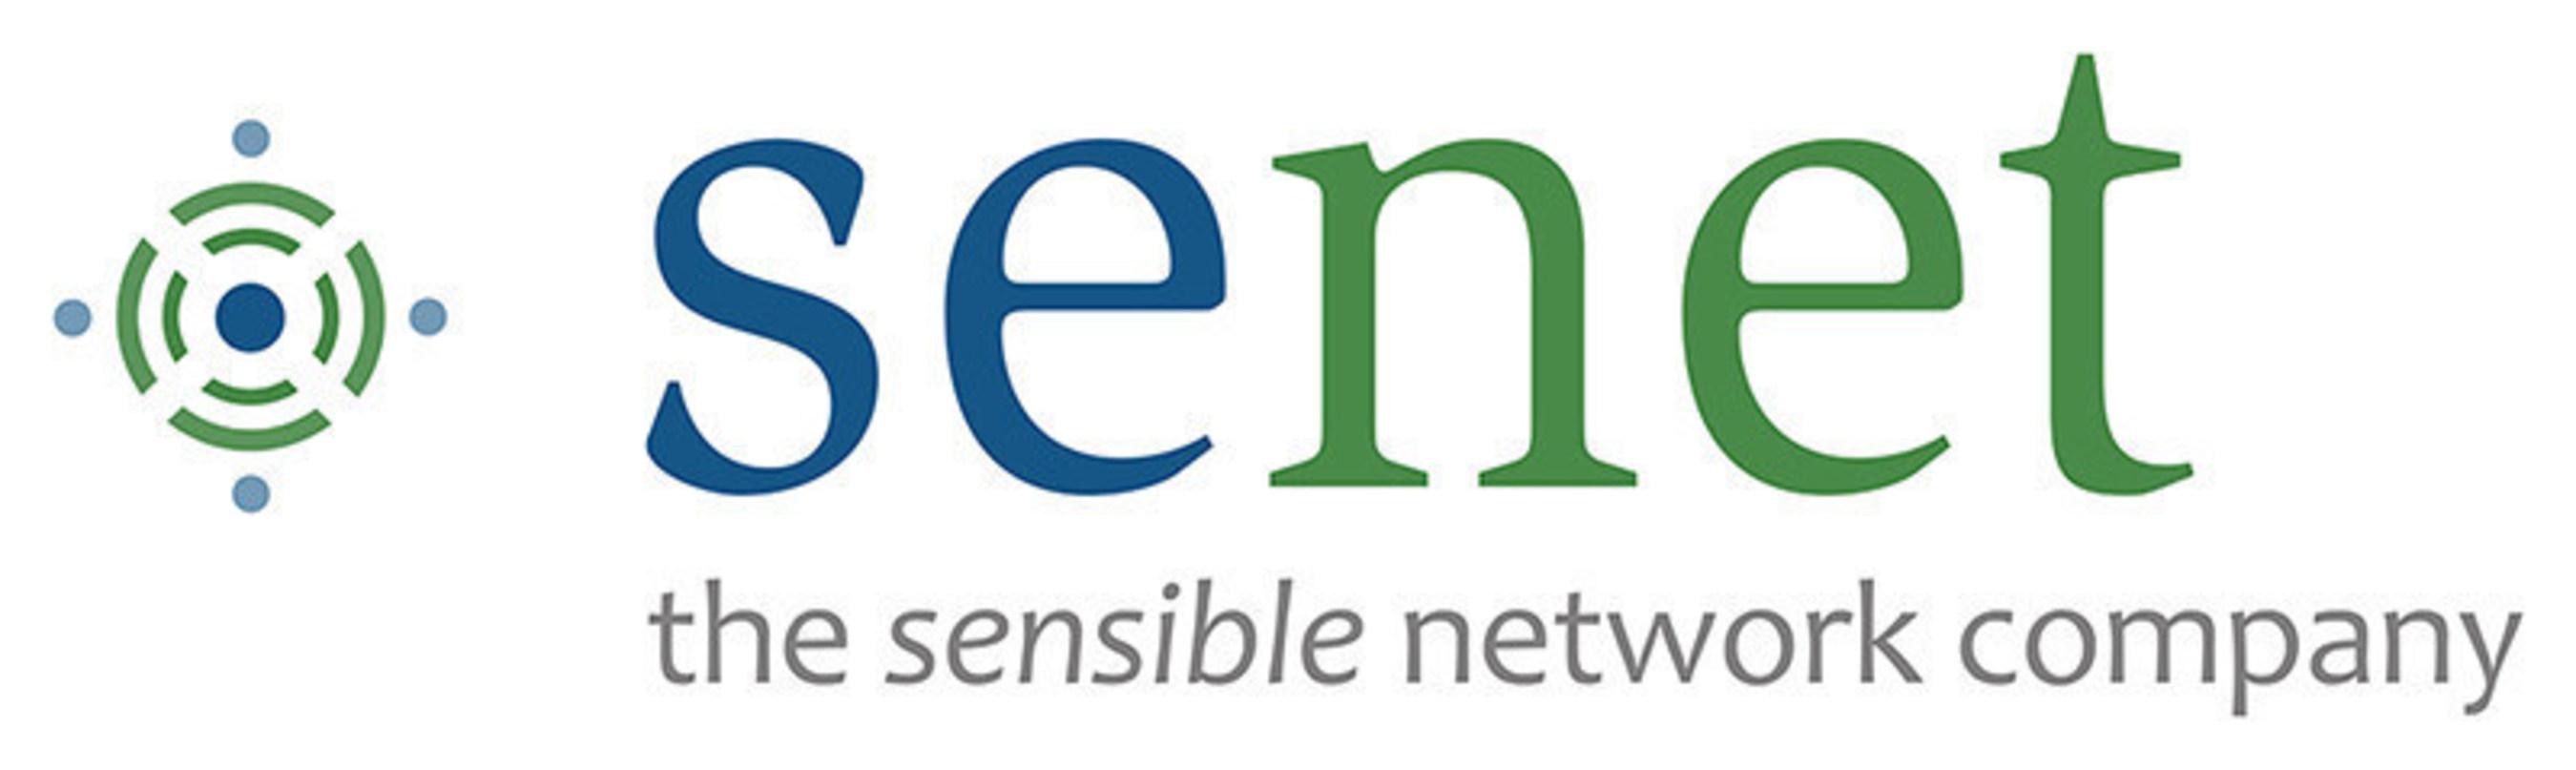 Senet Announces Expansion of the Senet LoRa-based Low Power Wide Area (LPWA) Network at Mobile